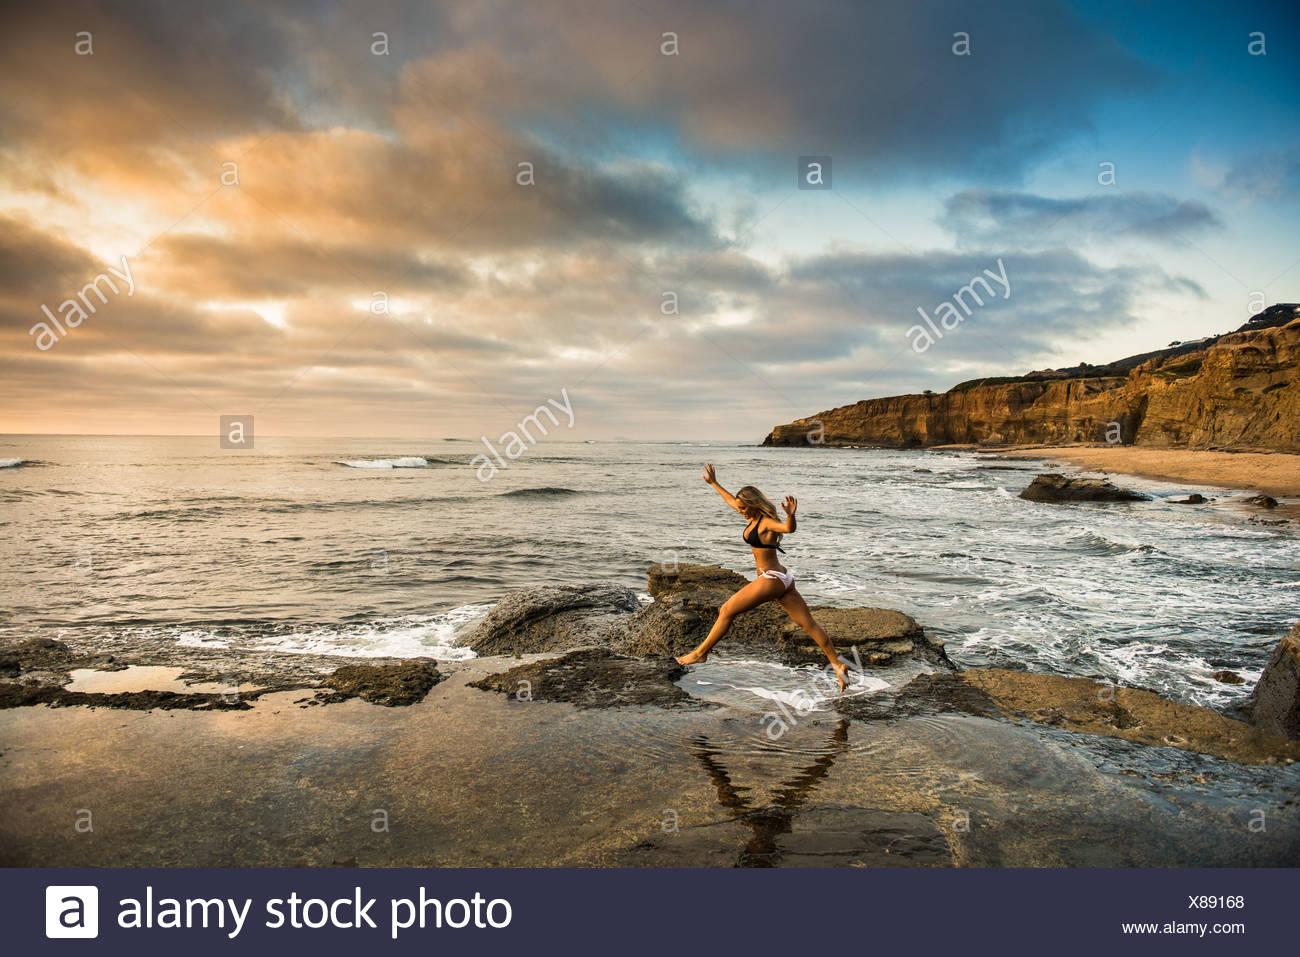 Young woman in bikini leaping from rocks on beach - Stock Image